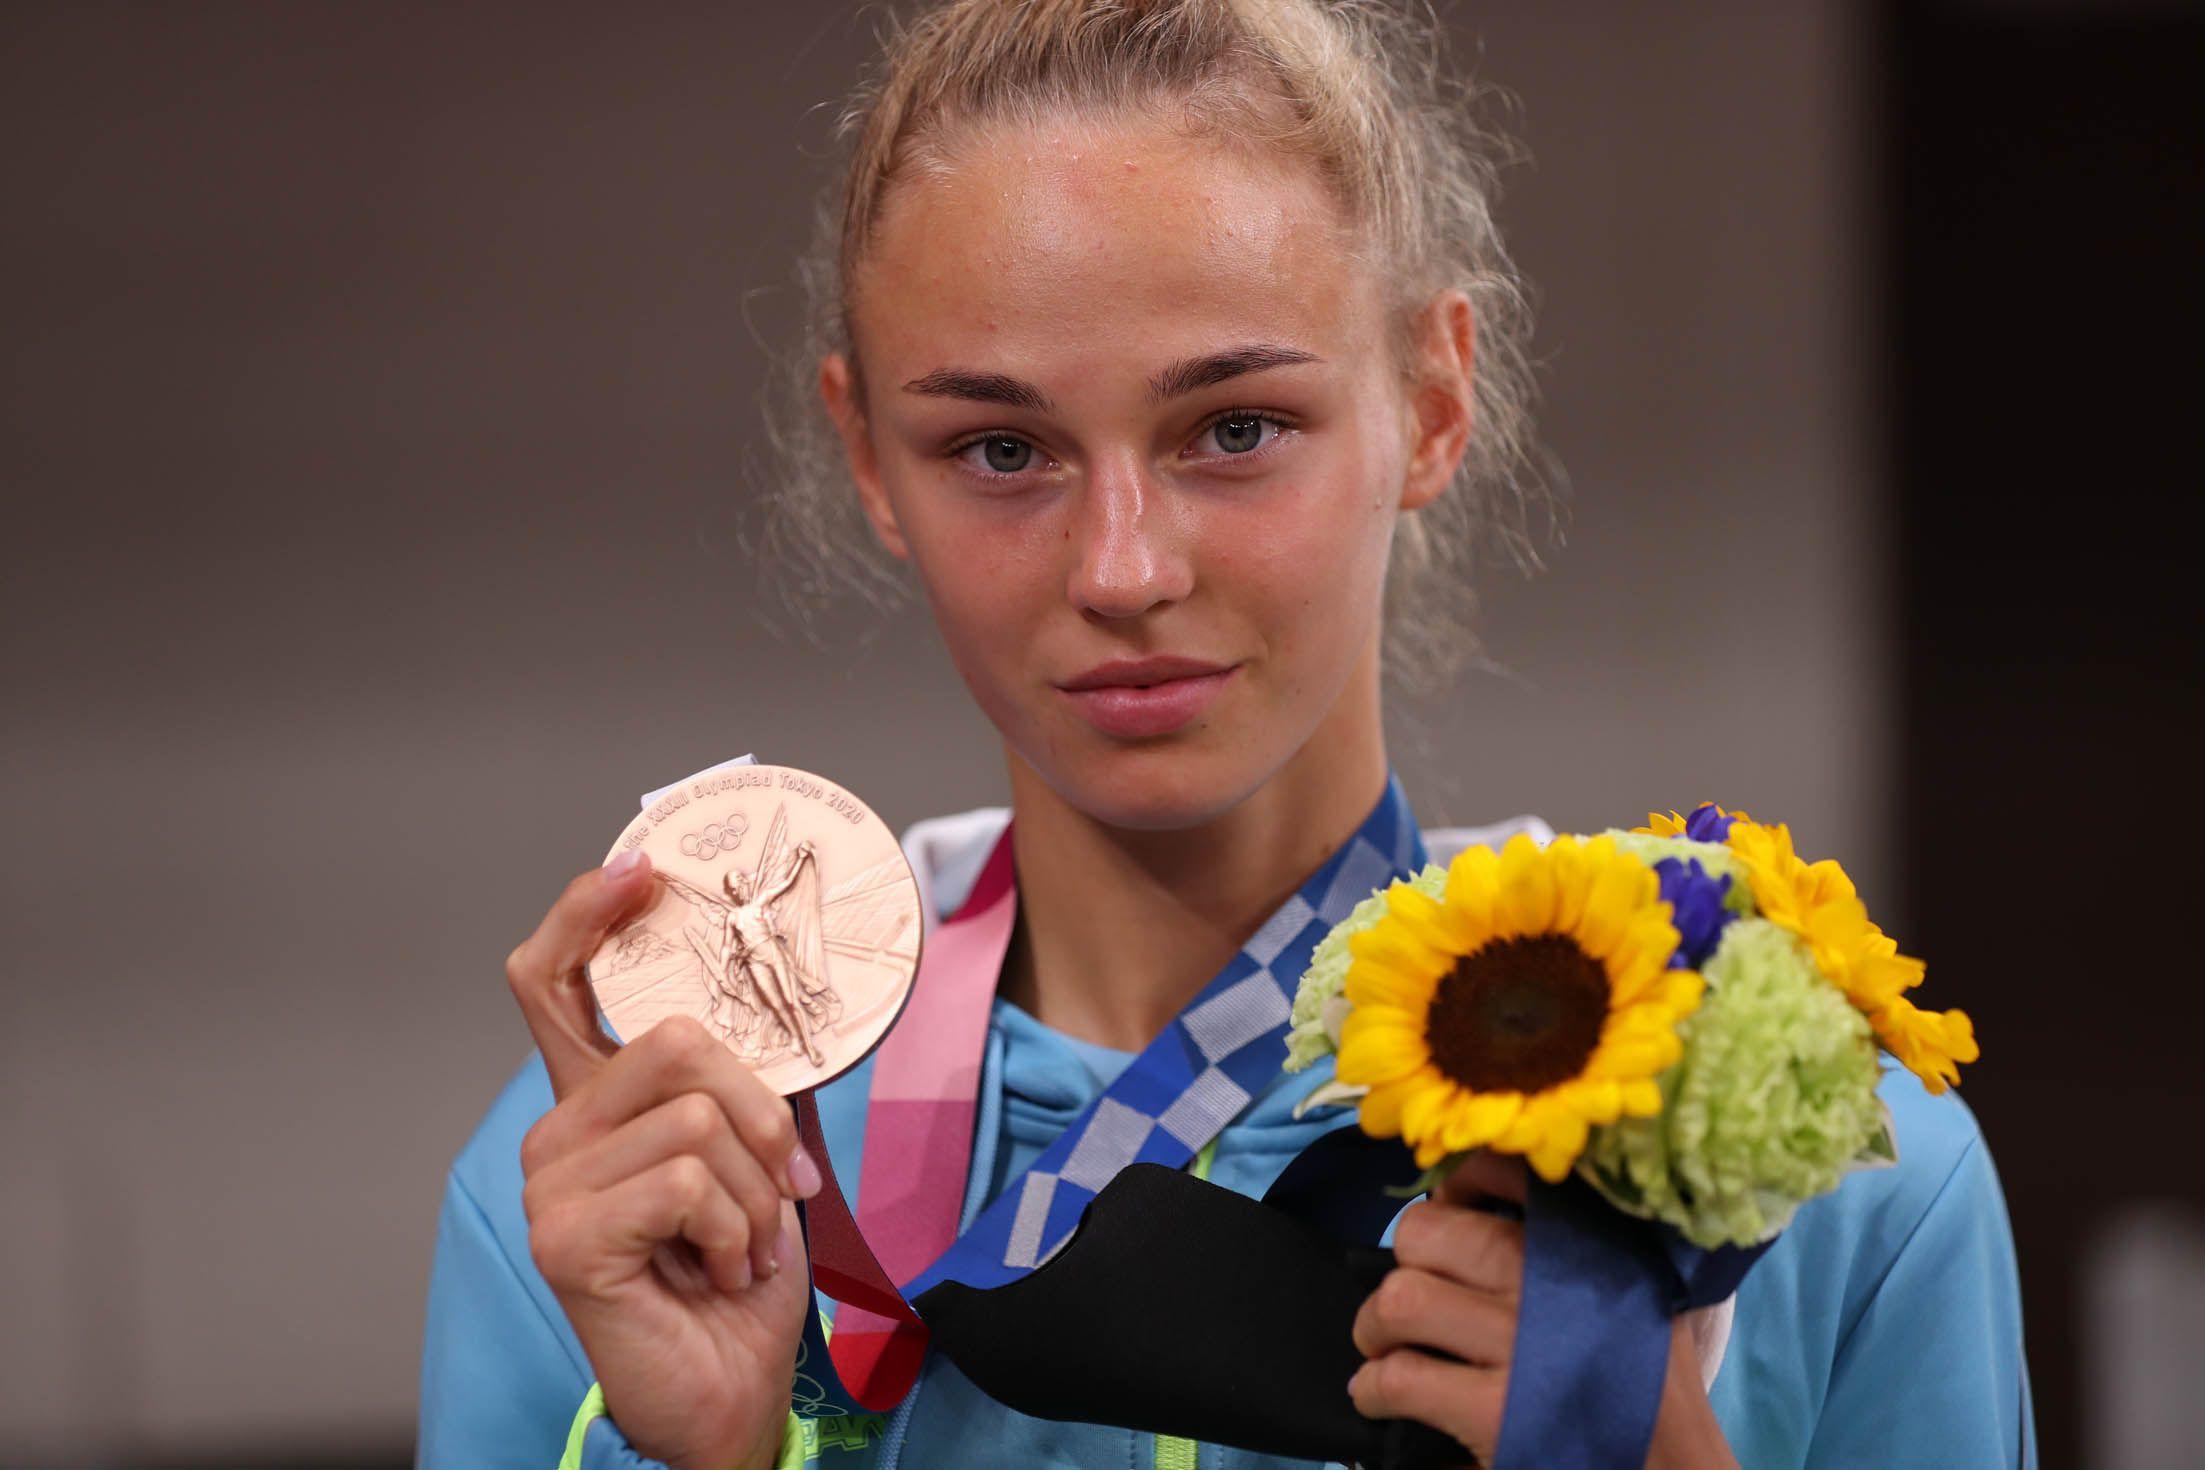 Награда и слезы Дарьи Белодед